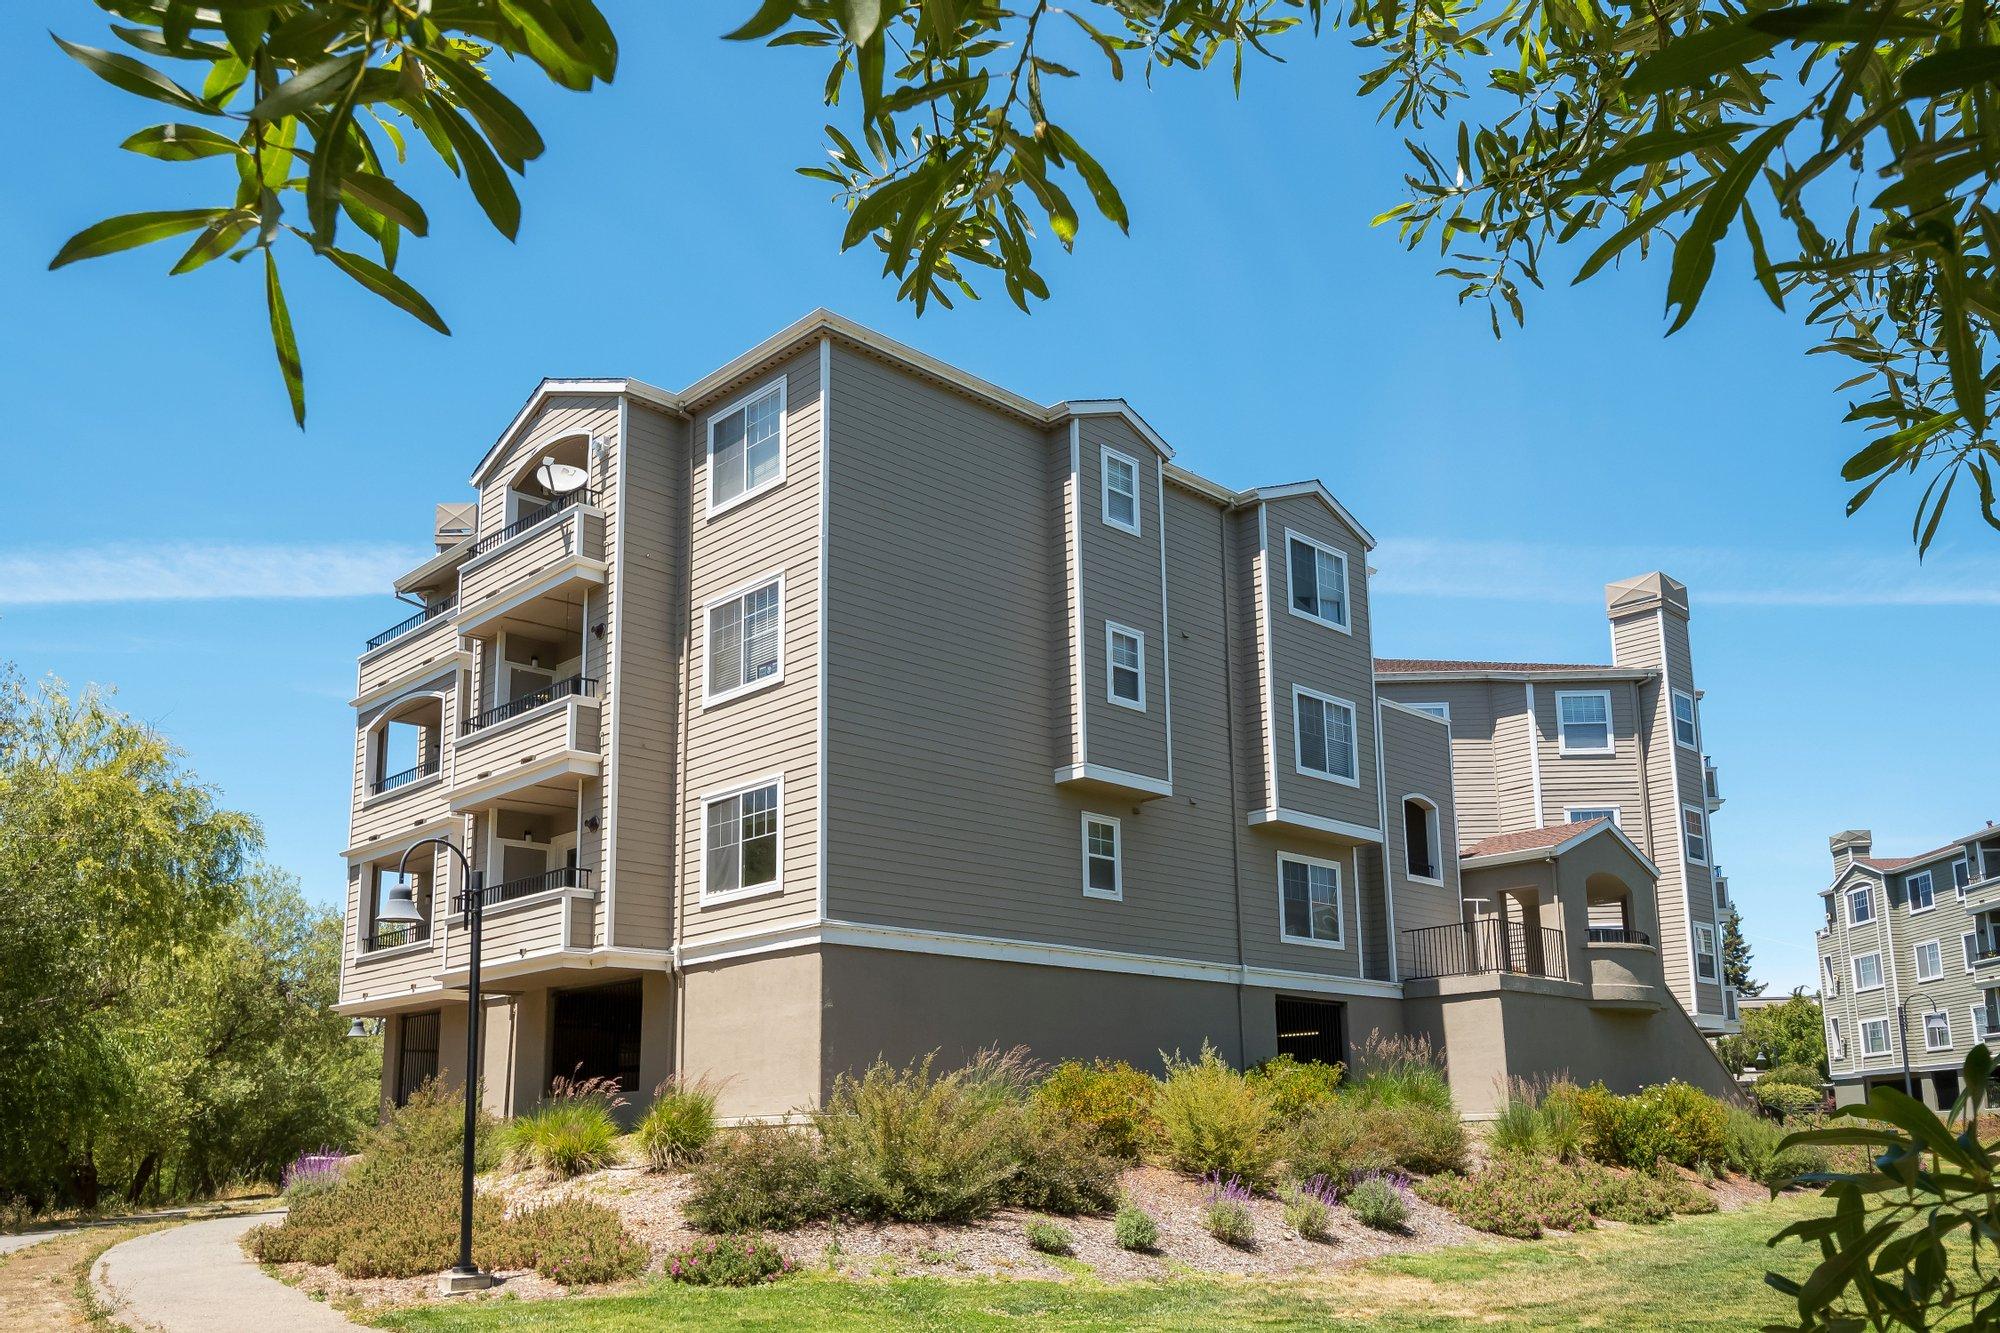 Condo in Petaluma, California, United States 1